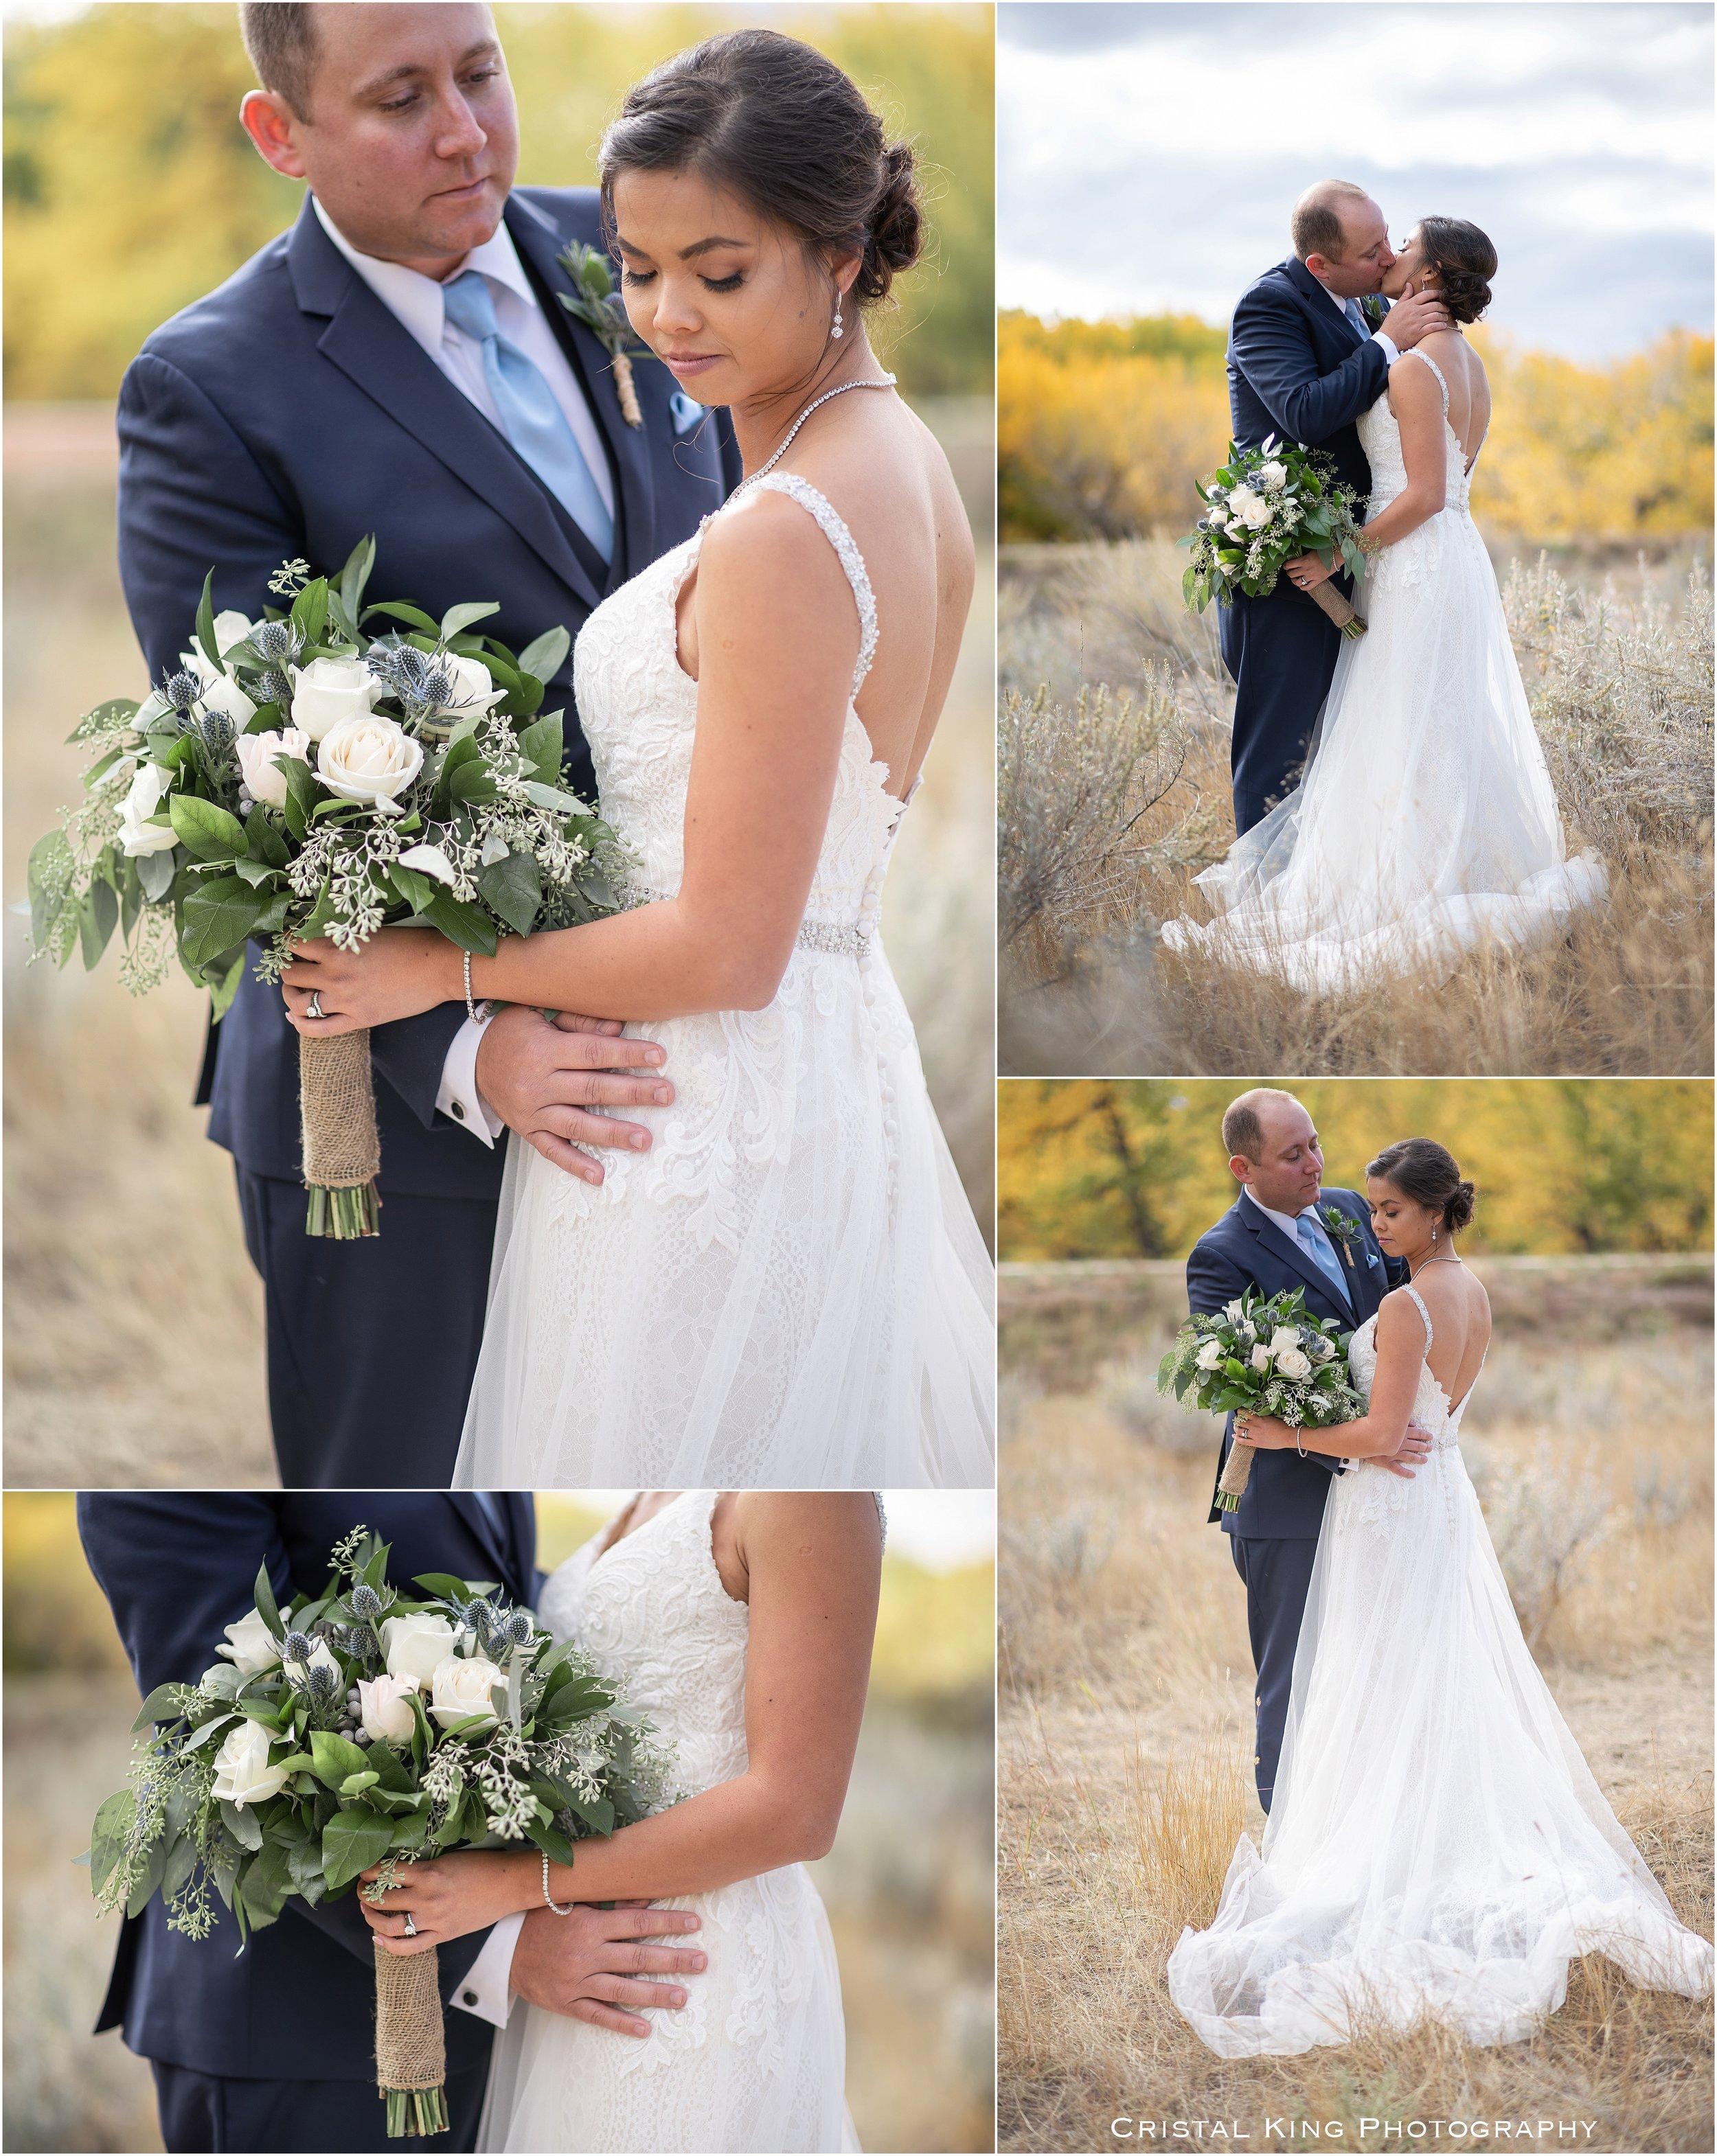 Quynh-Scotts-Wedding-58.jpg